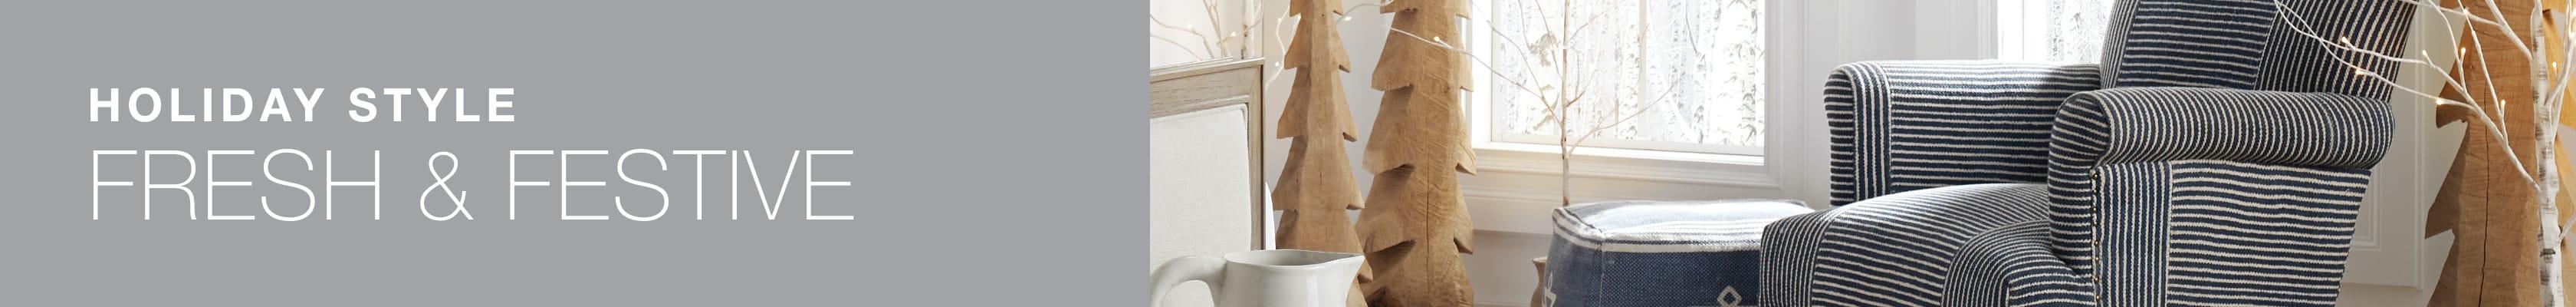 Shop Fresh & Festive at Arhaus this holiday season